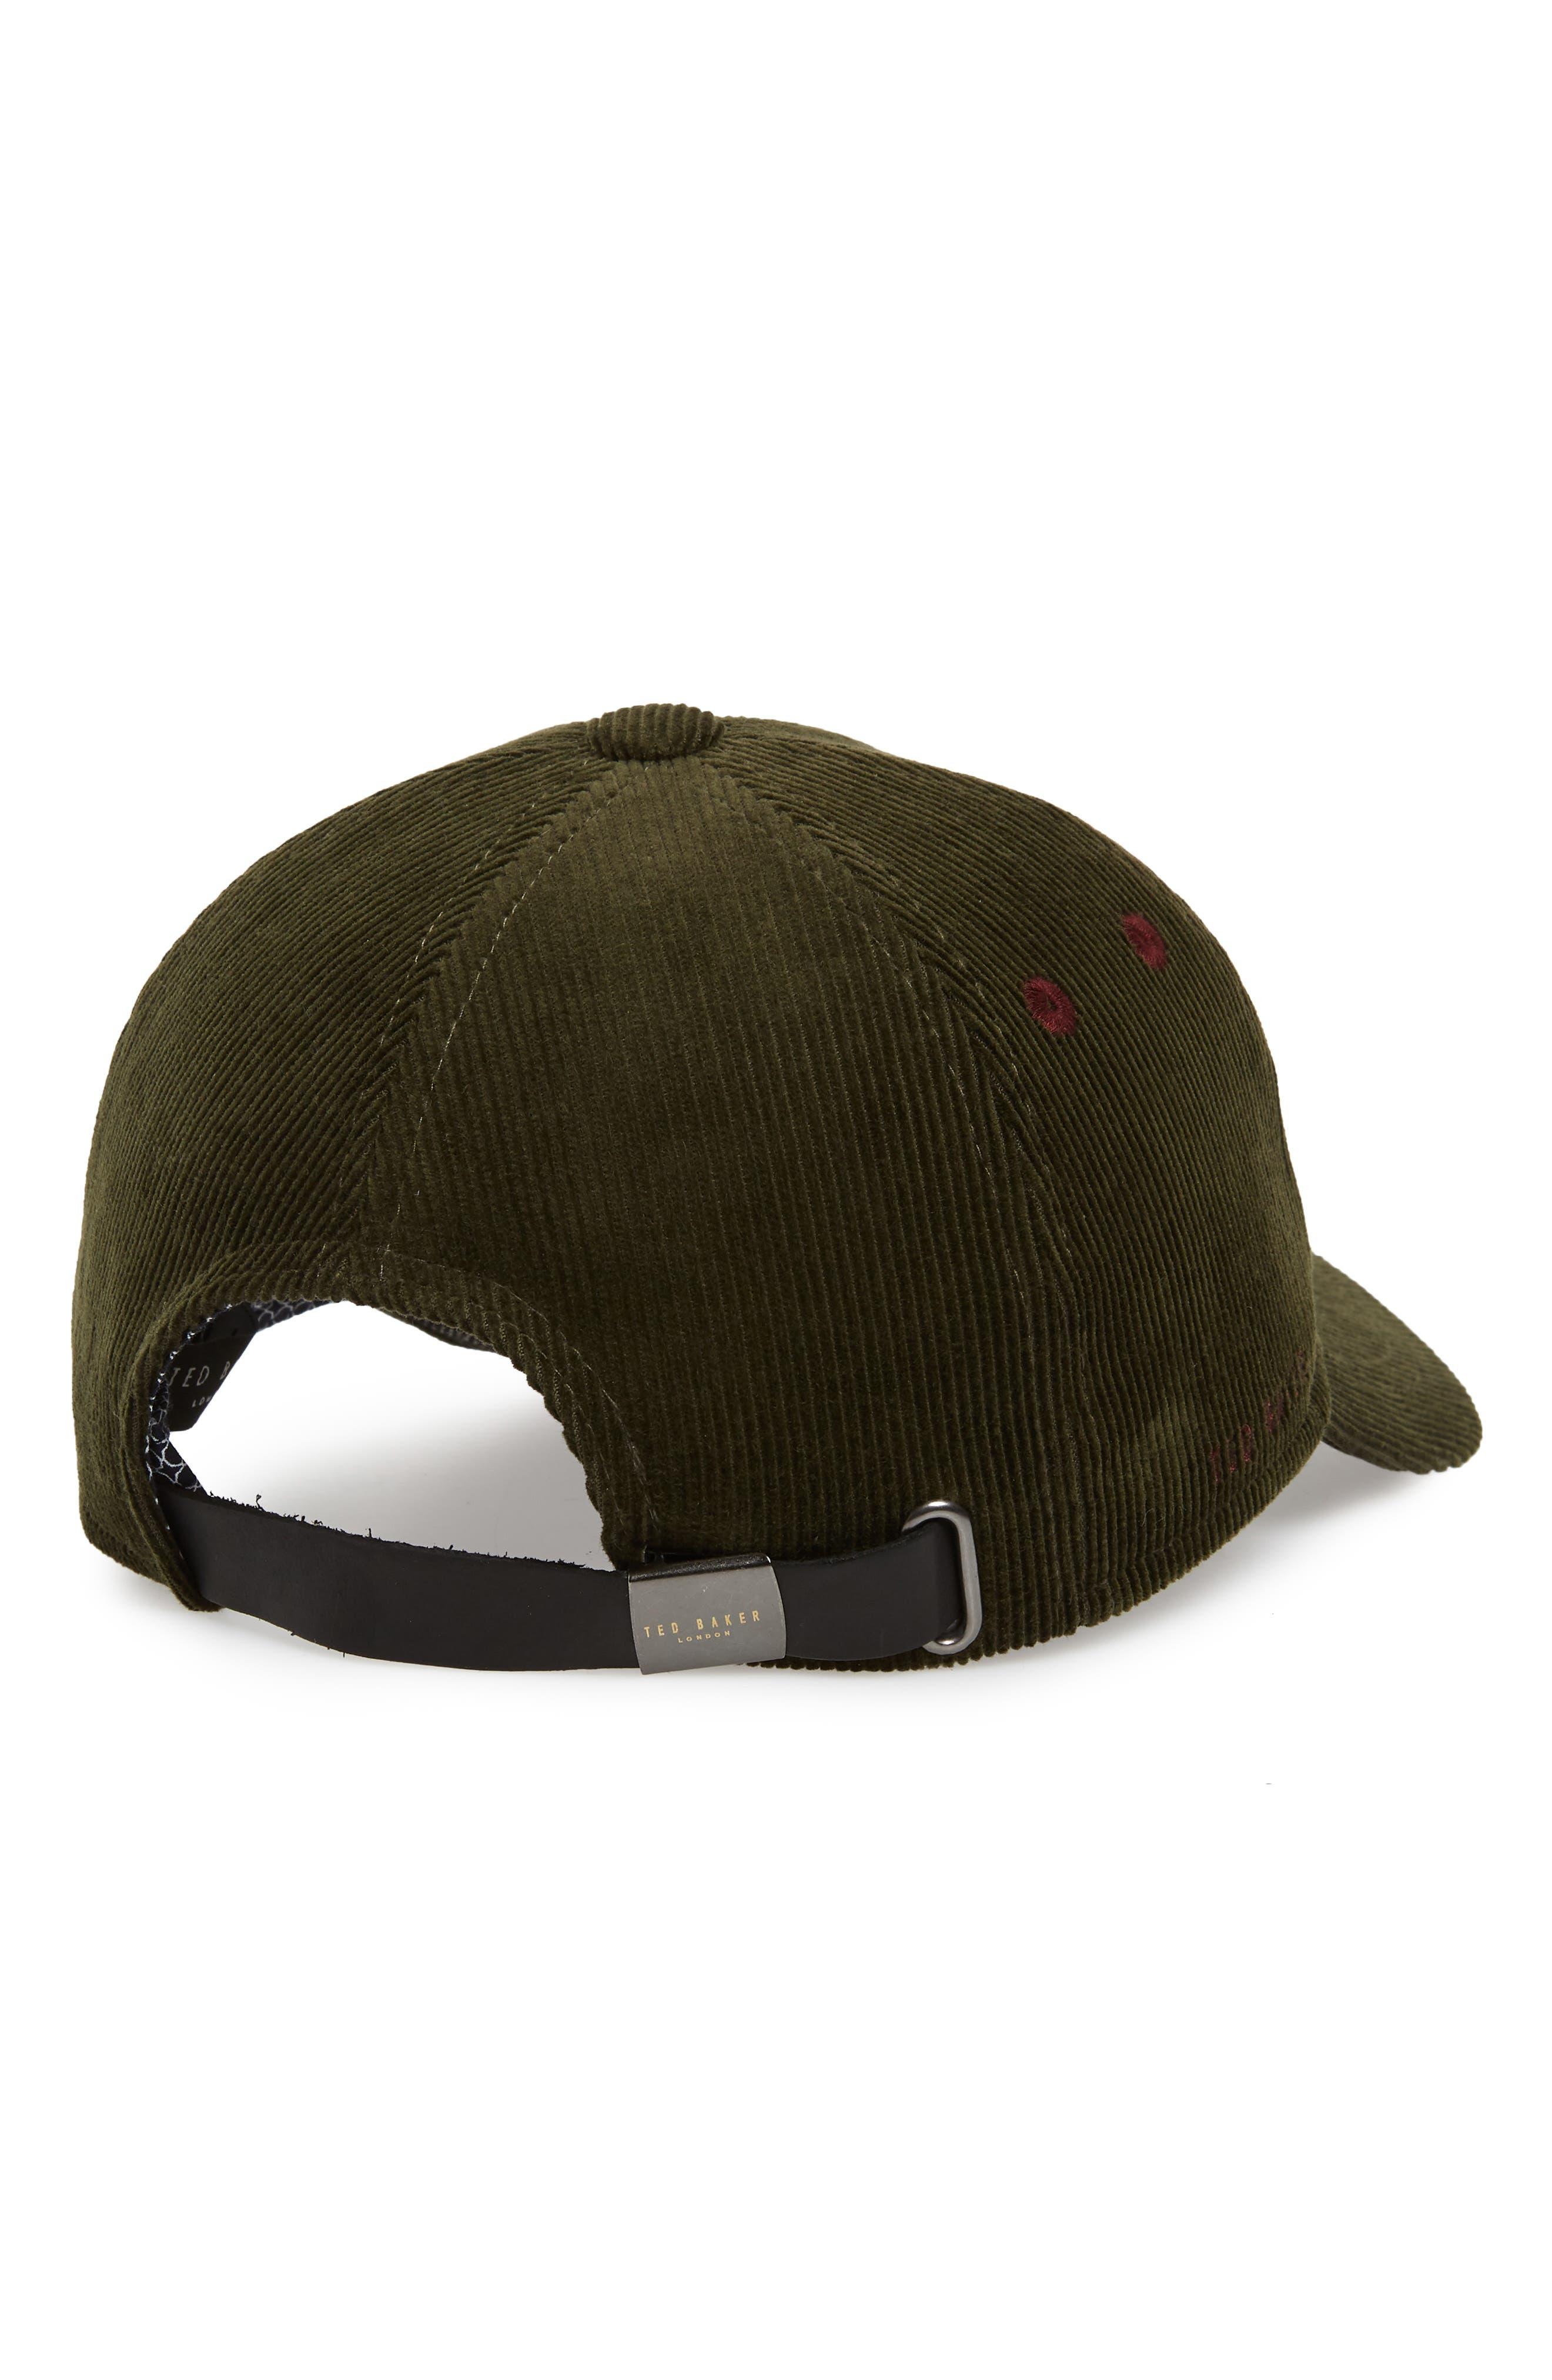 71870bacdf28 Men s Ted Baker London Hats